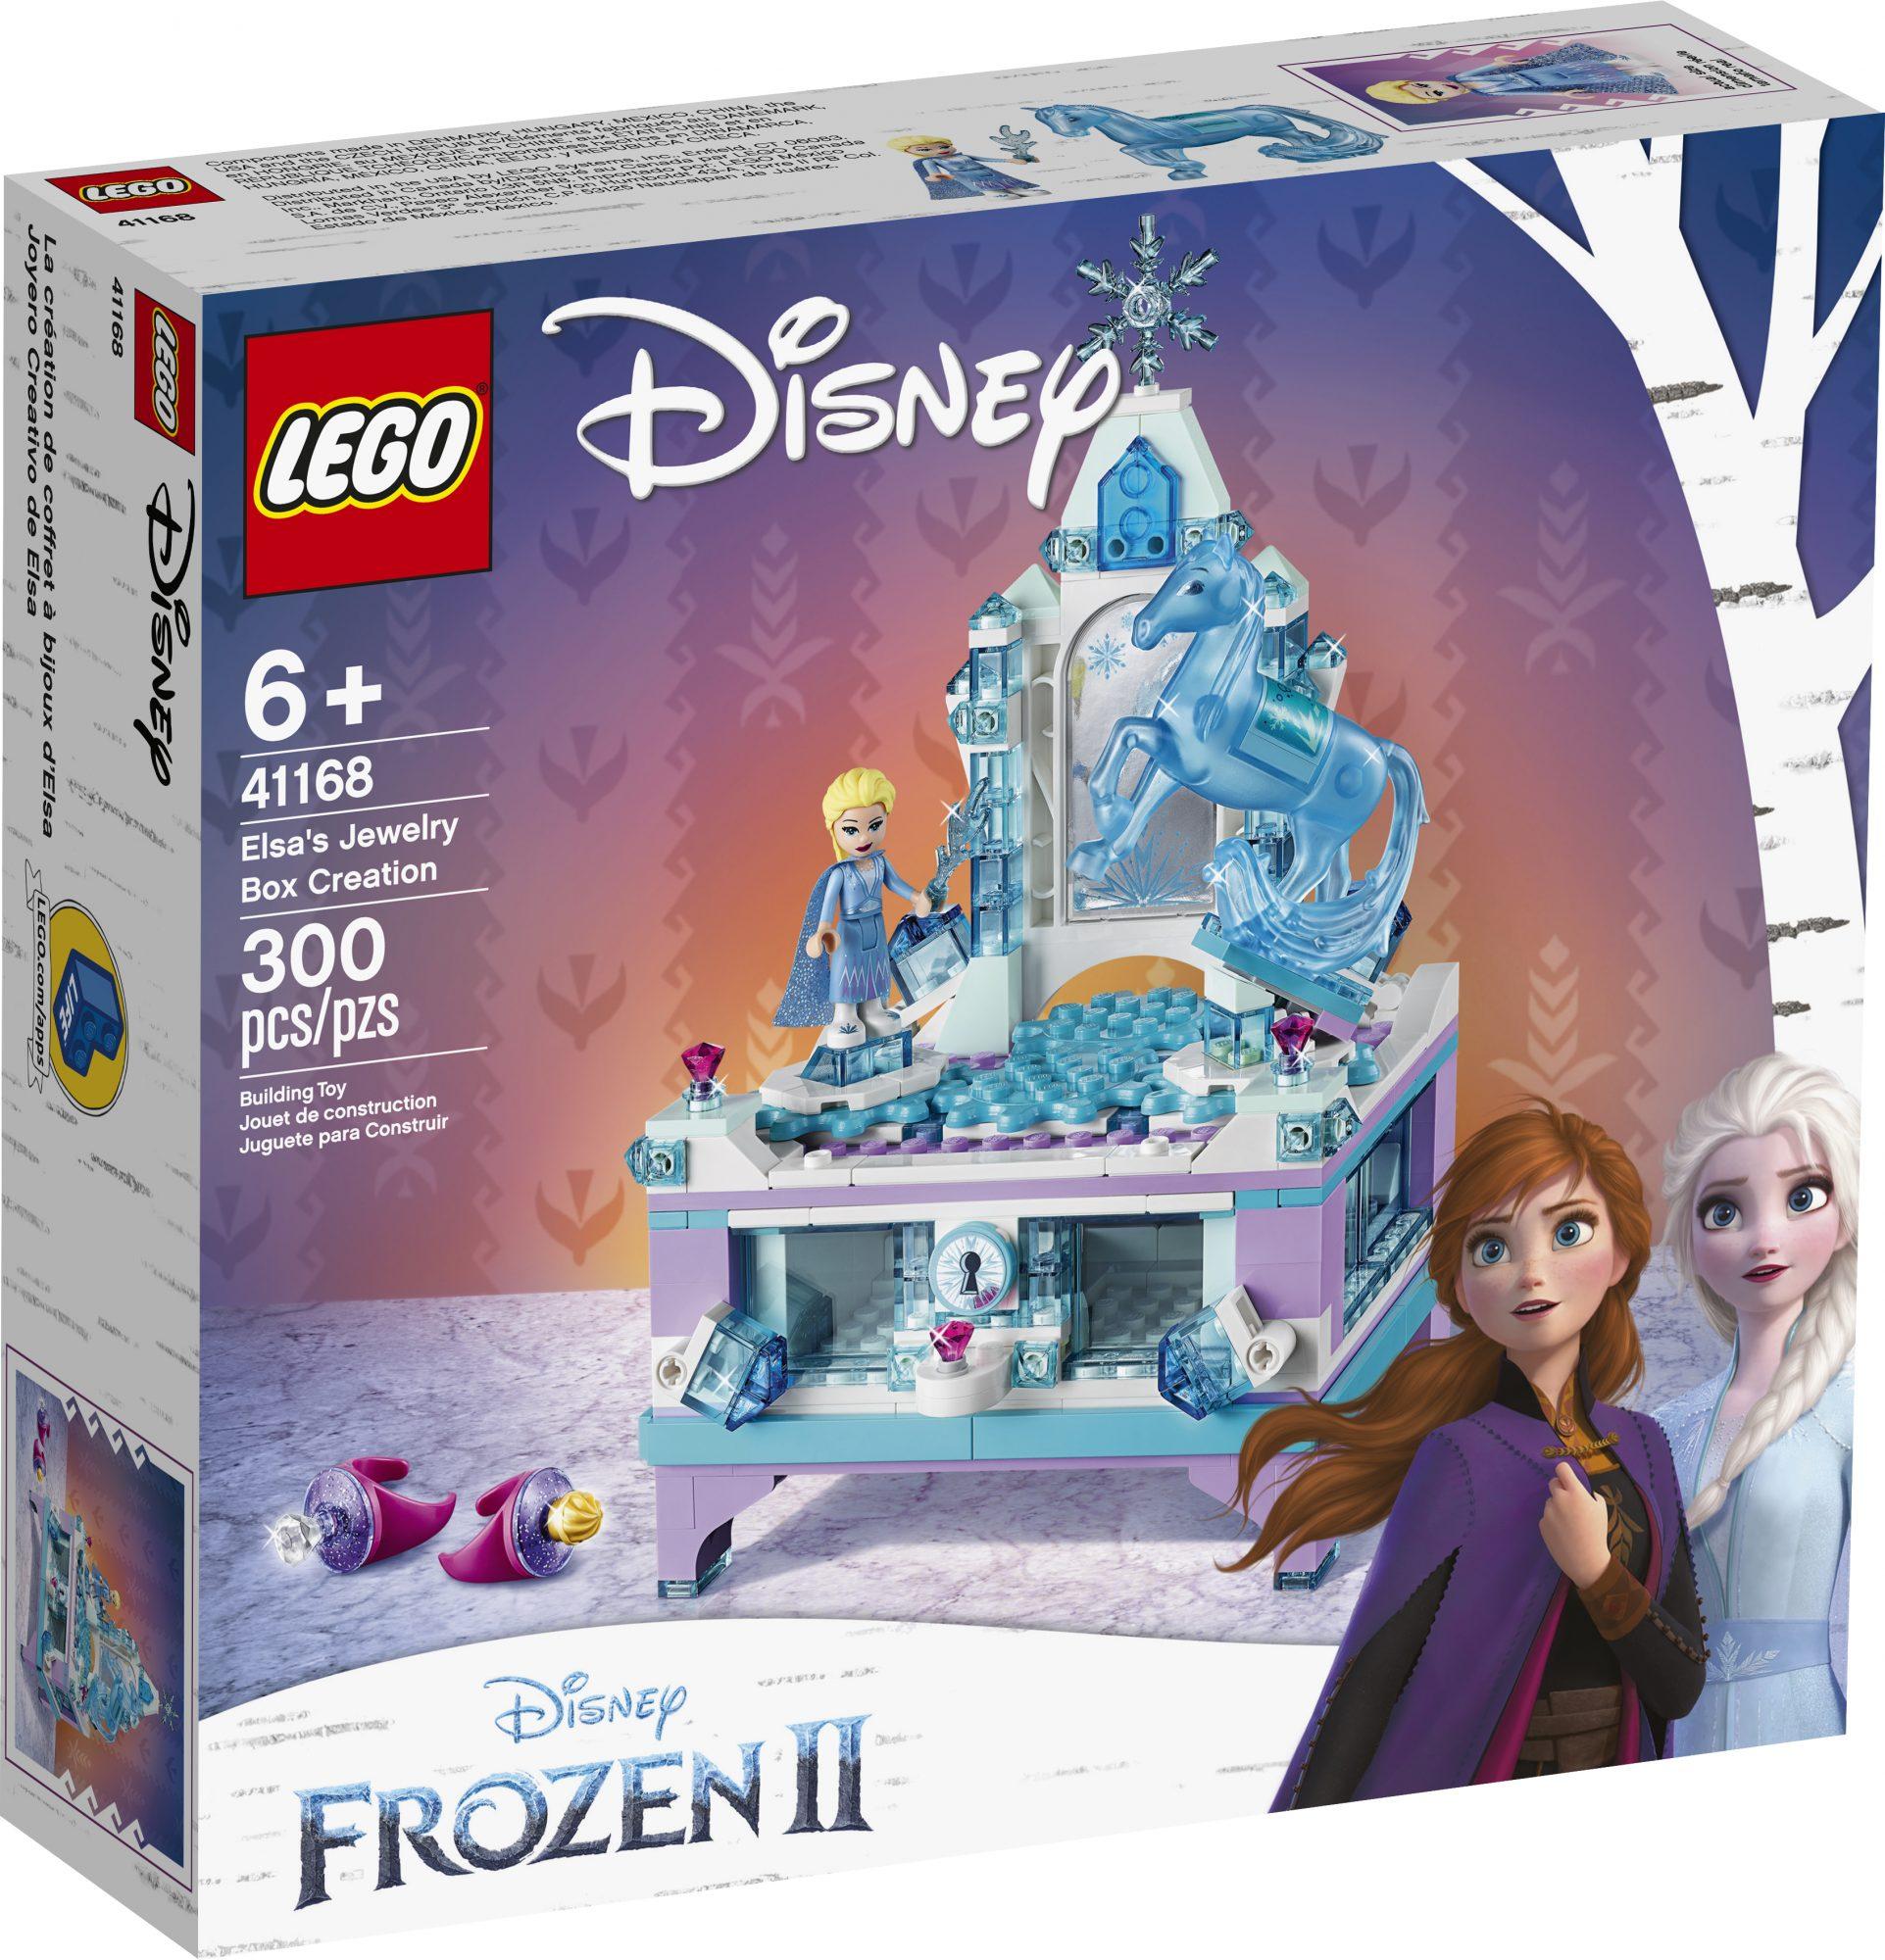 new Frozen toys